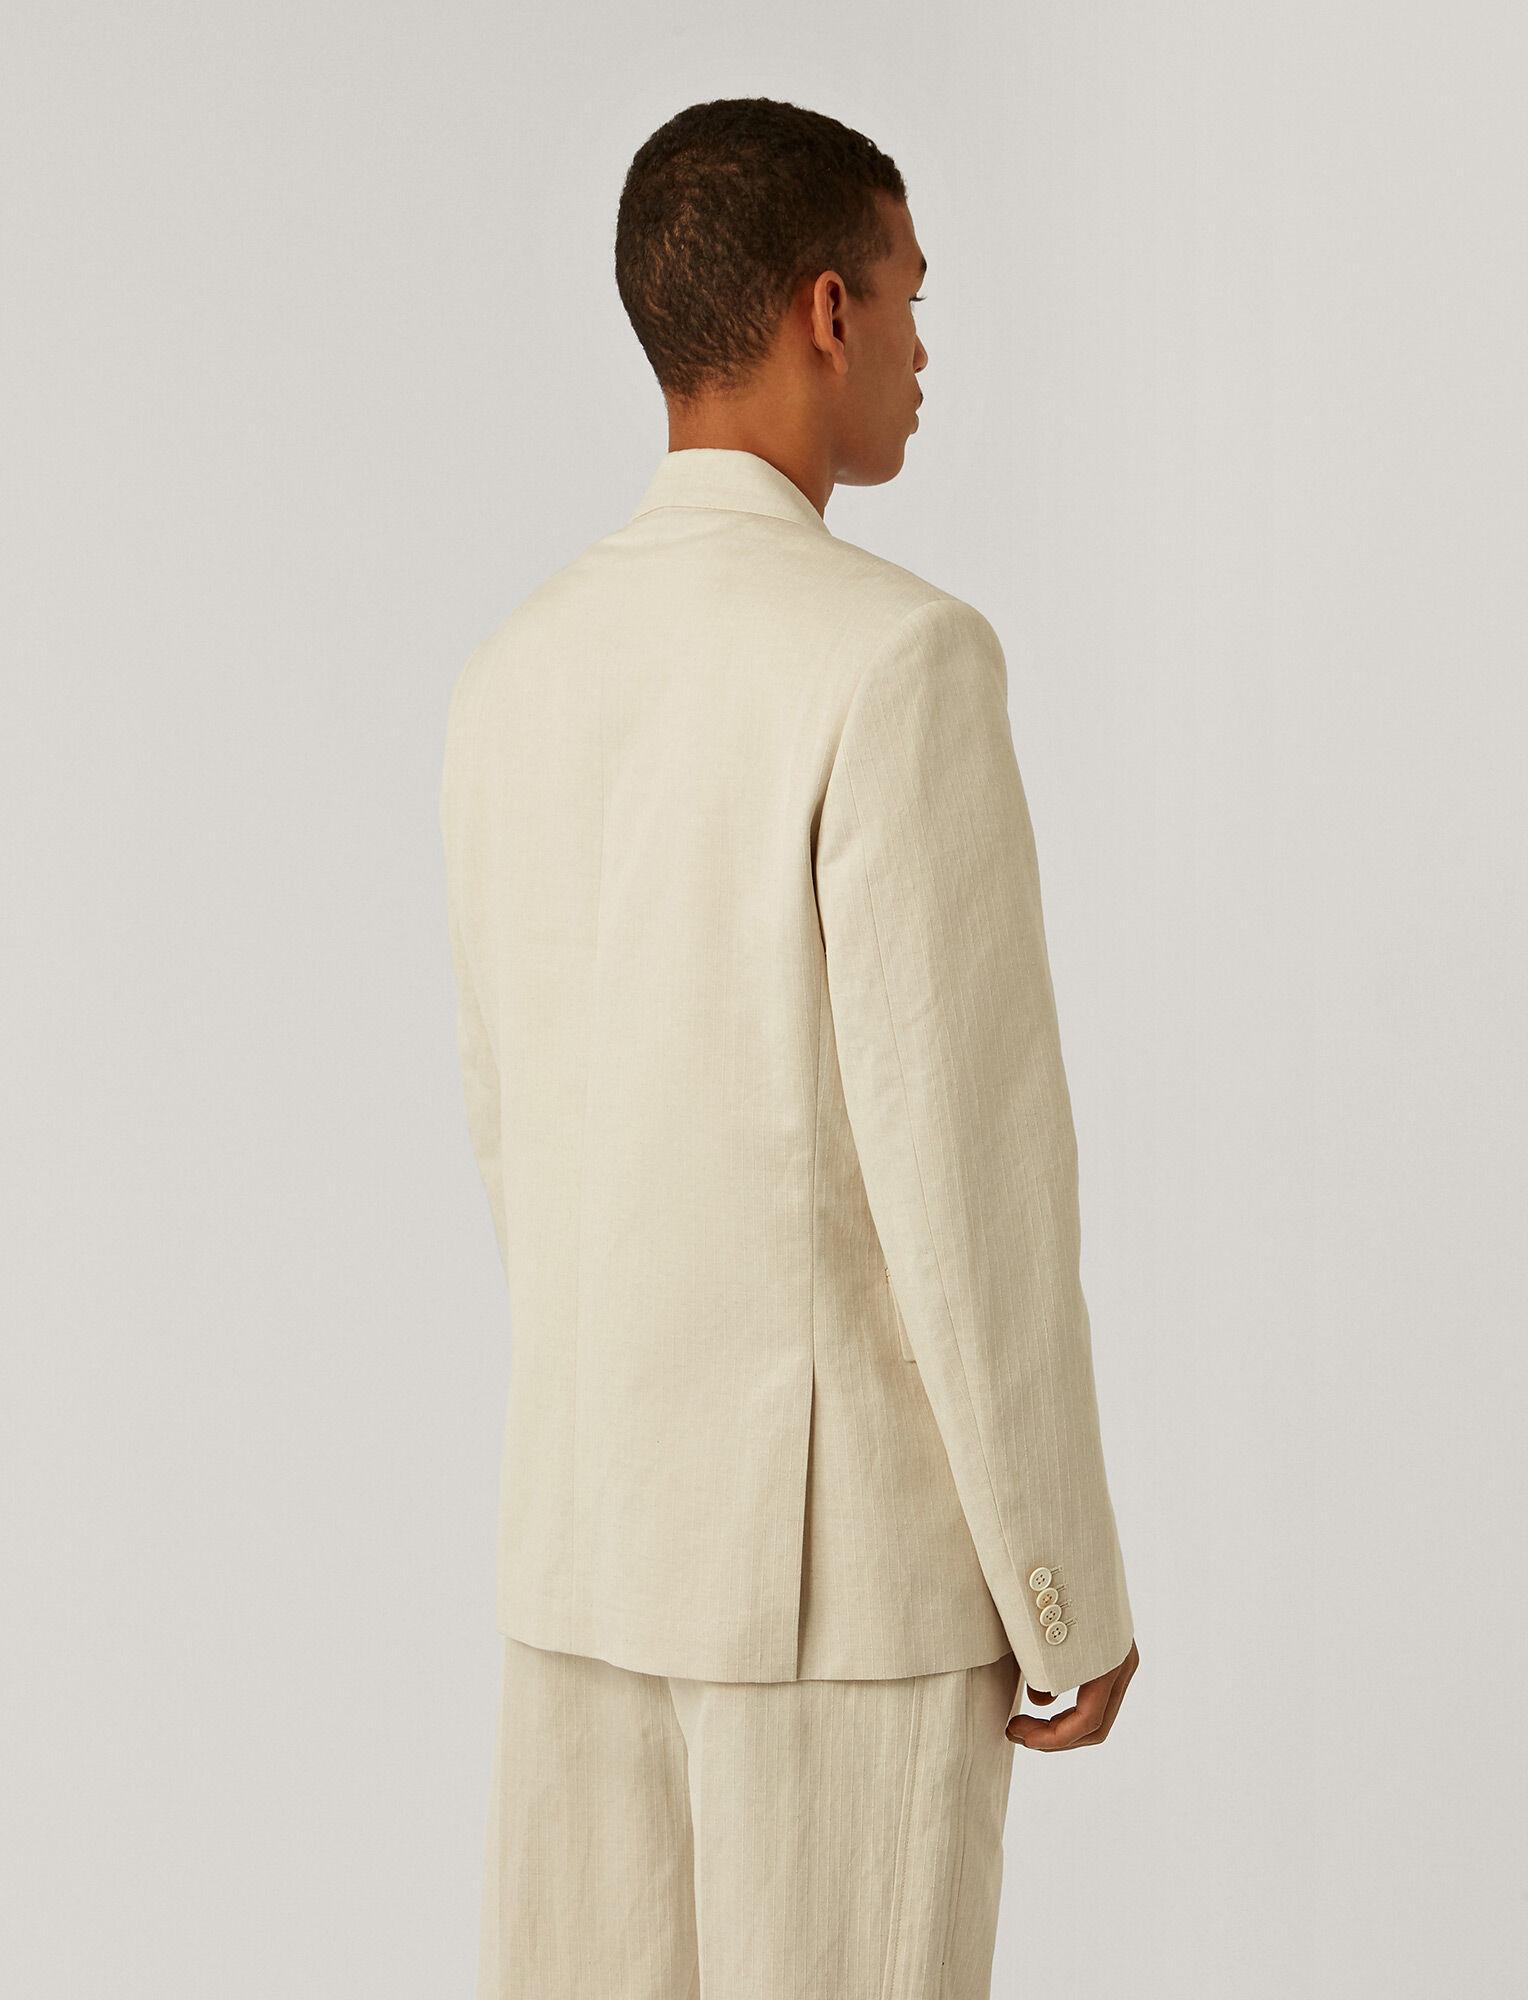 Joseph, Cotton Linen Dobby Jacket, in ECRU